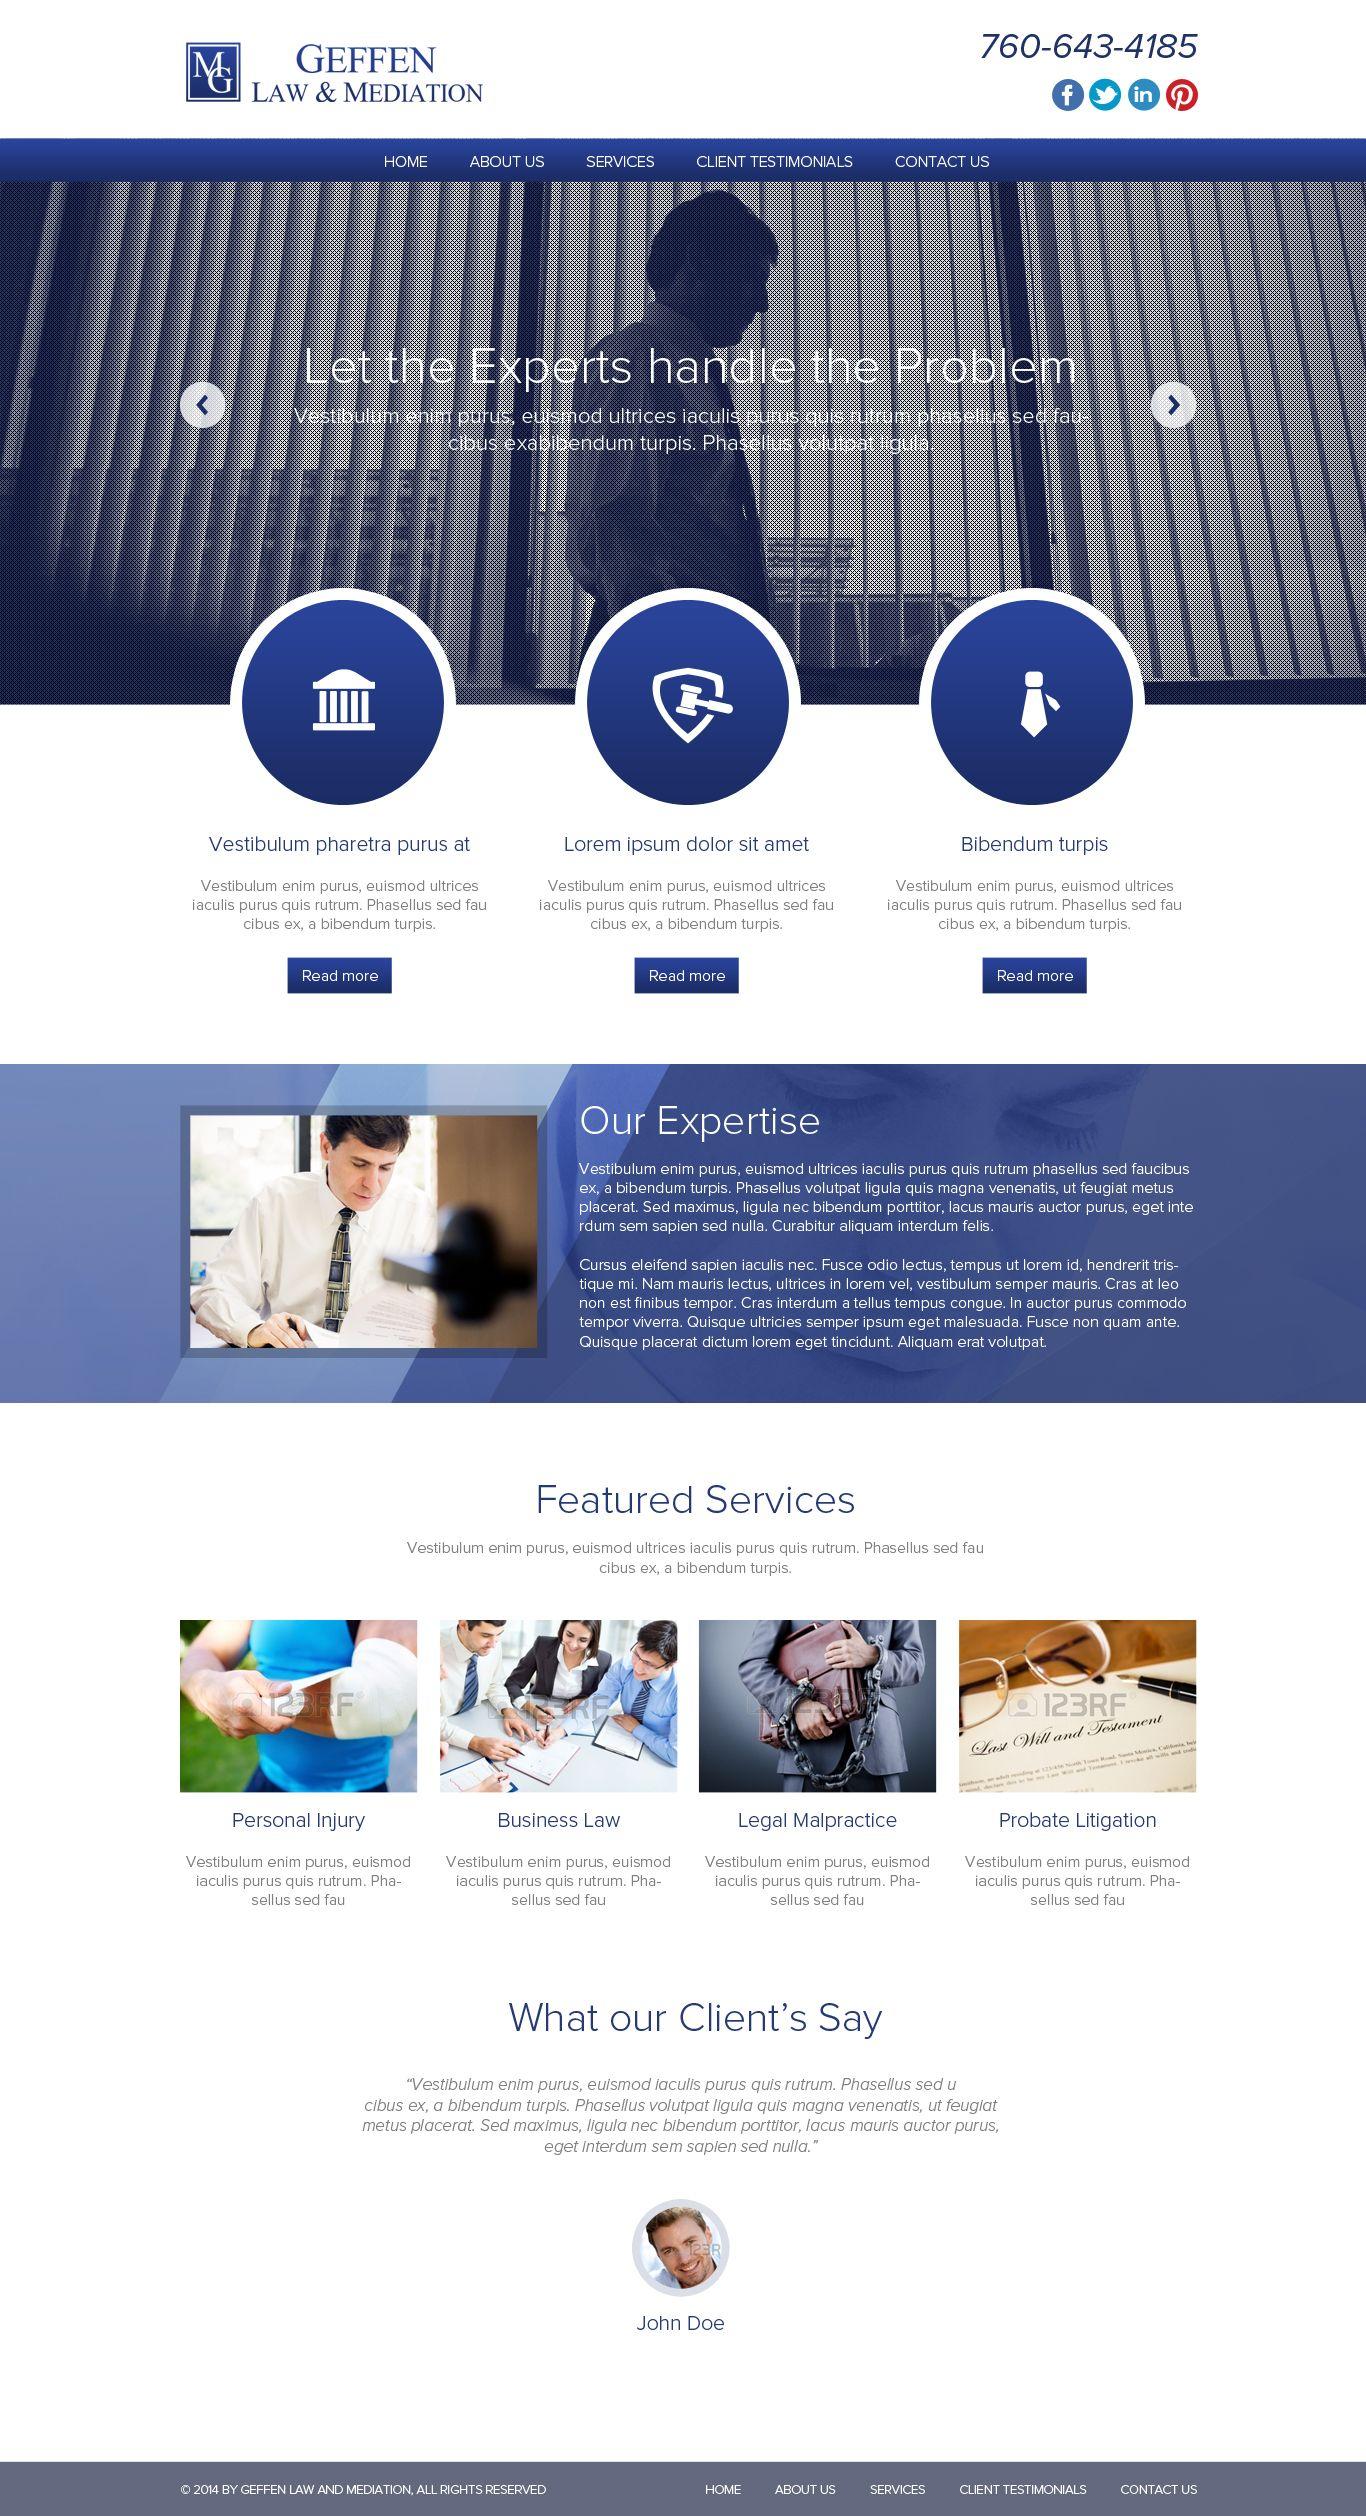 Responsive Website Design Affordable Ecommerce Web Design Small Business Web Development Design Ecommerce Web Design Web Design